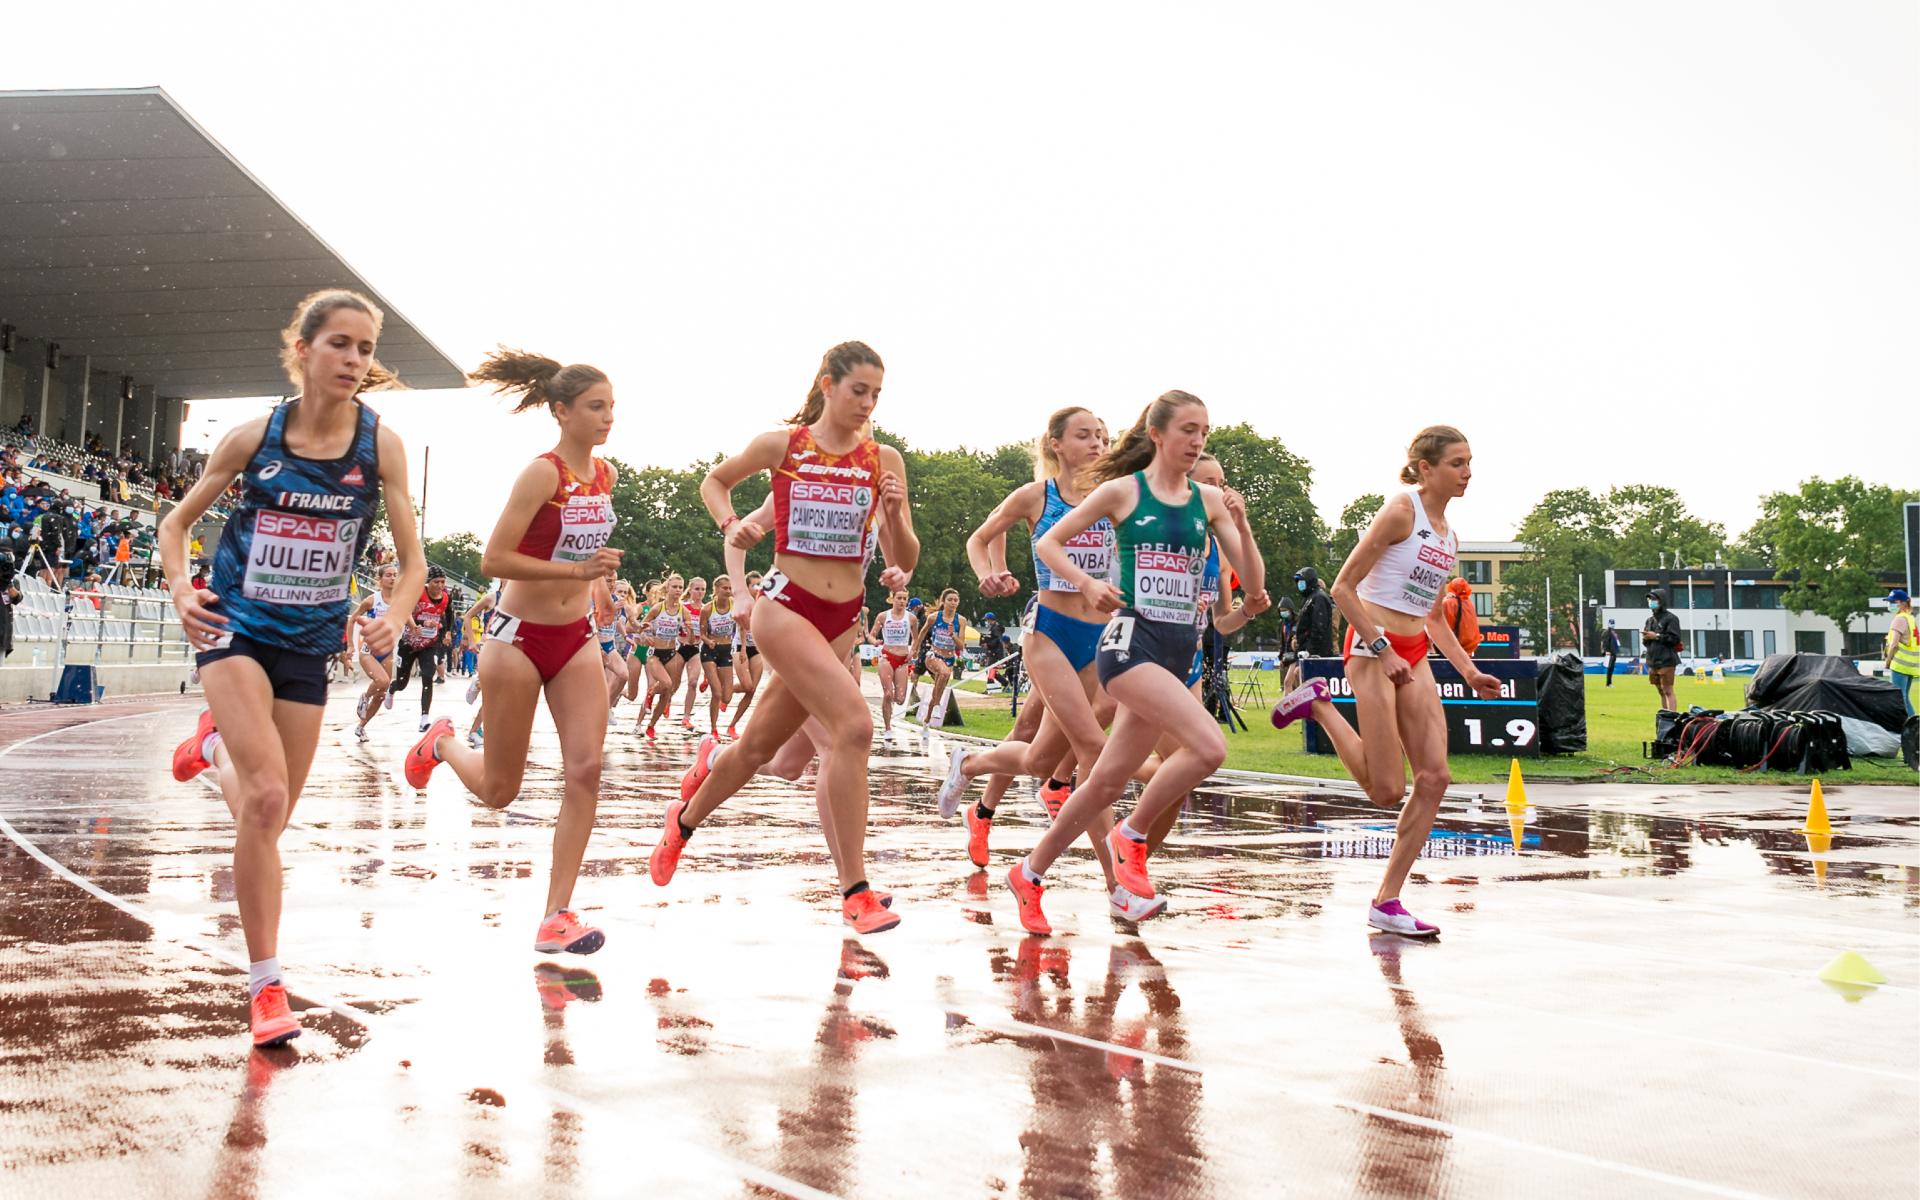 Фото: Jurij Kodrun/Getty Images for European Athletics